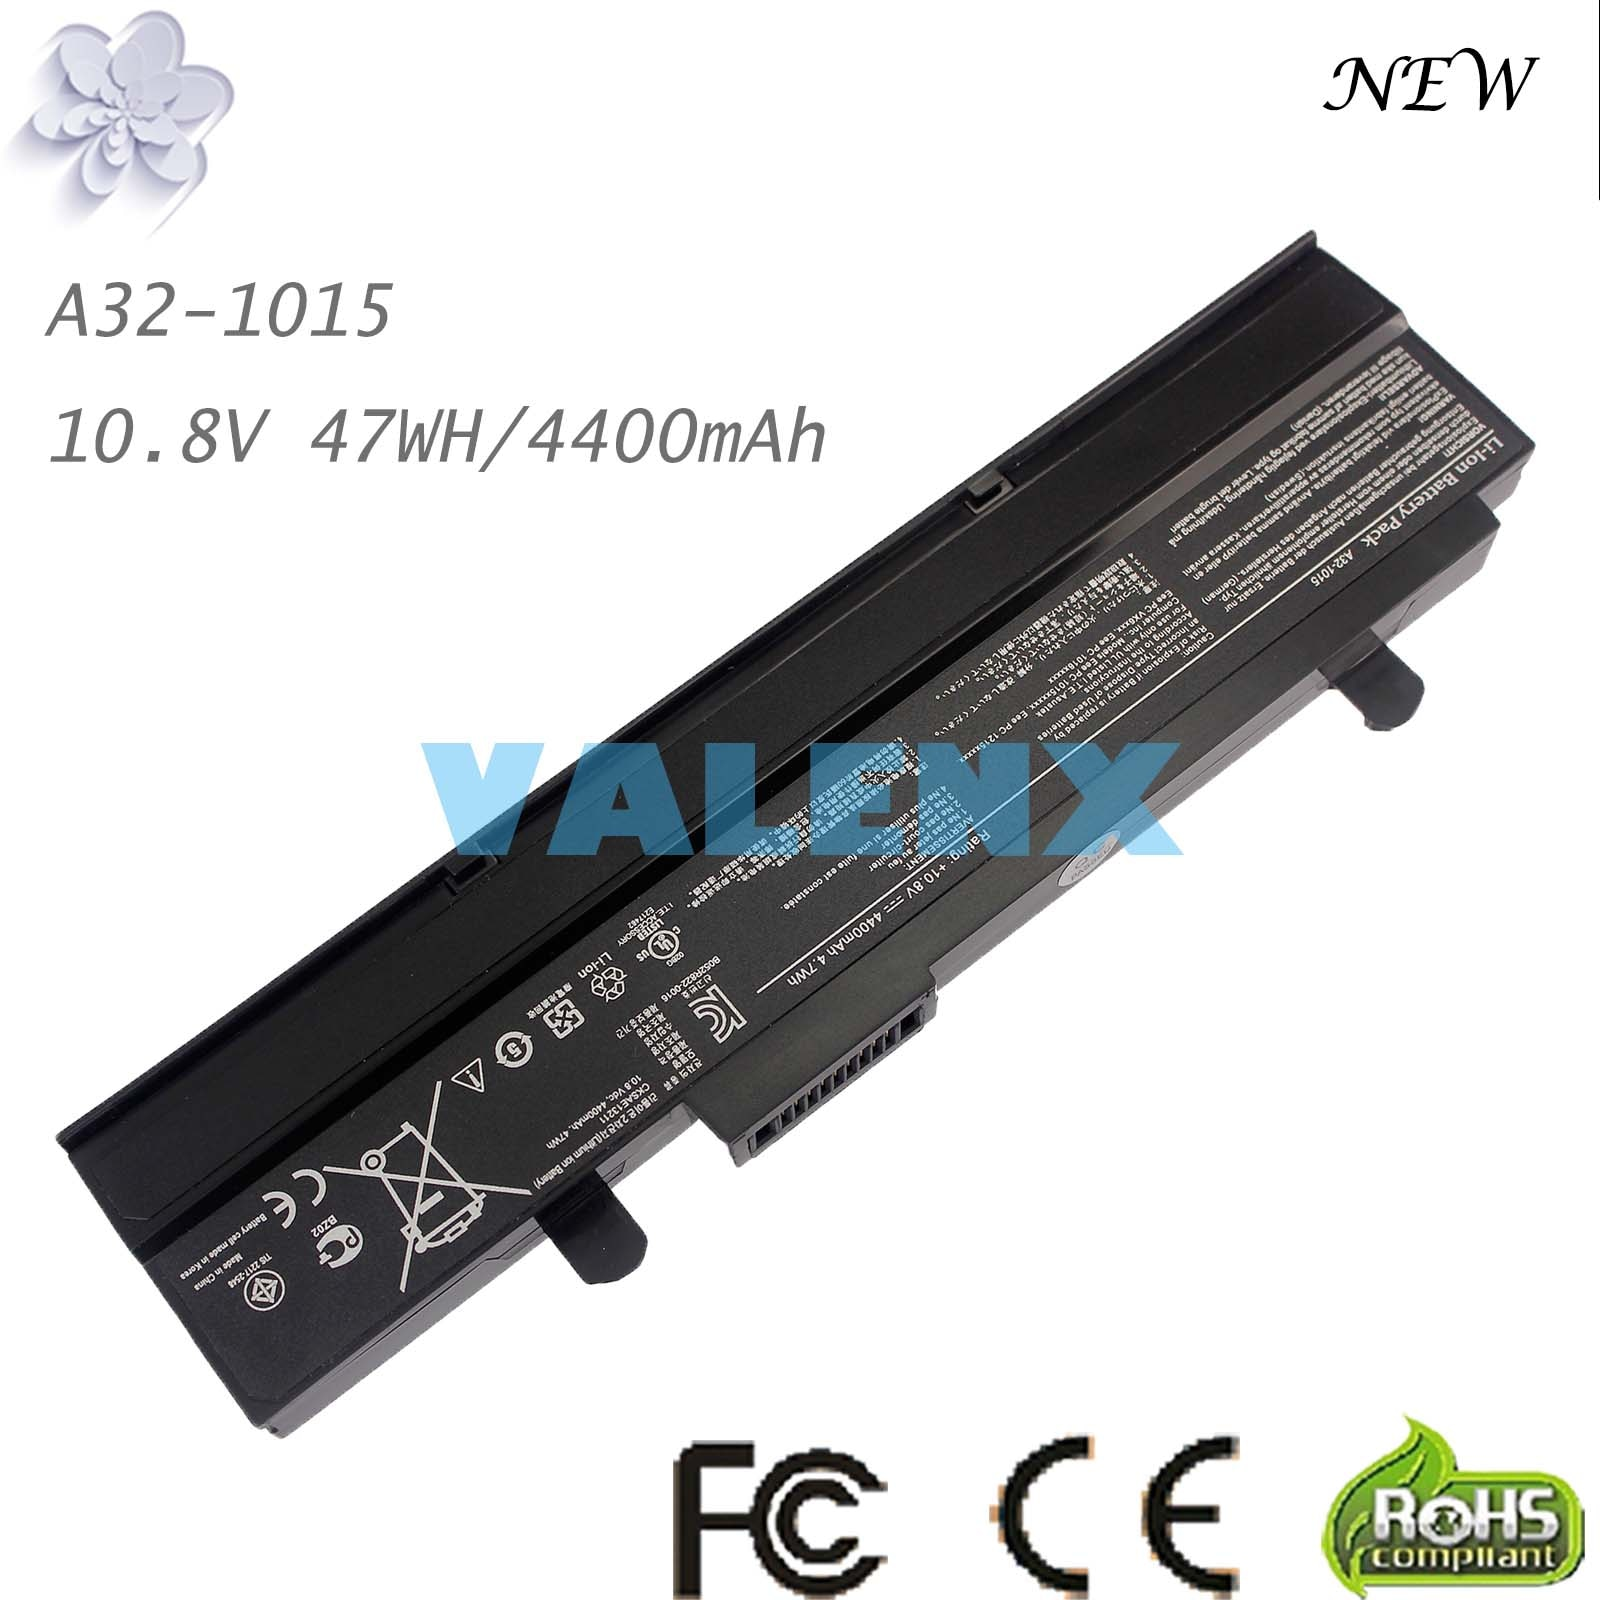 Batería del ordenador portátil para Asus Eee PC EPC 1215 PC 1215B 1215N 1015b 1015 1015bx 1015x1015 p A31-1015 A32-1015 AL31-1015